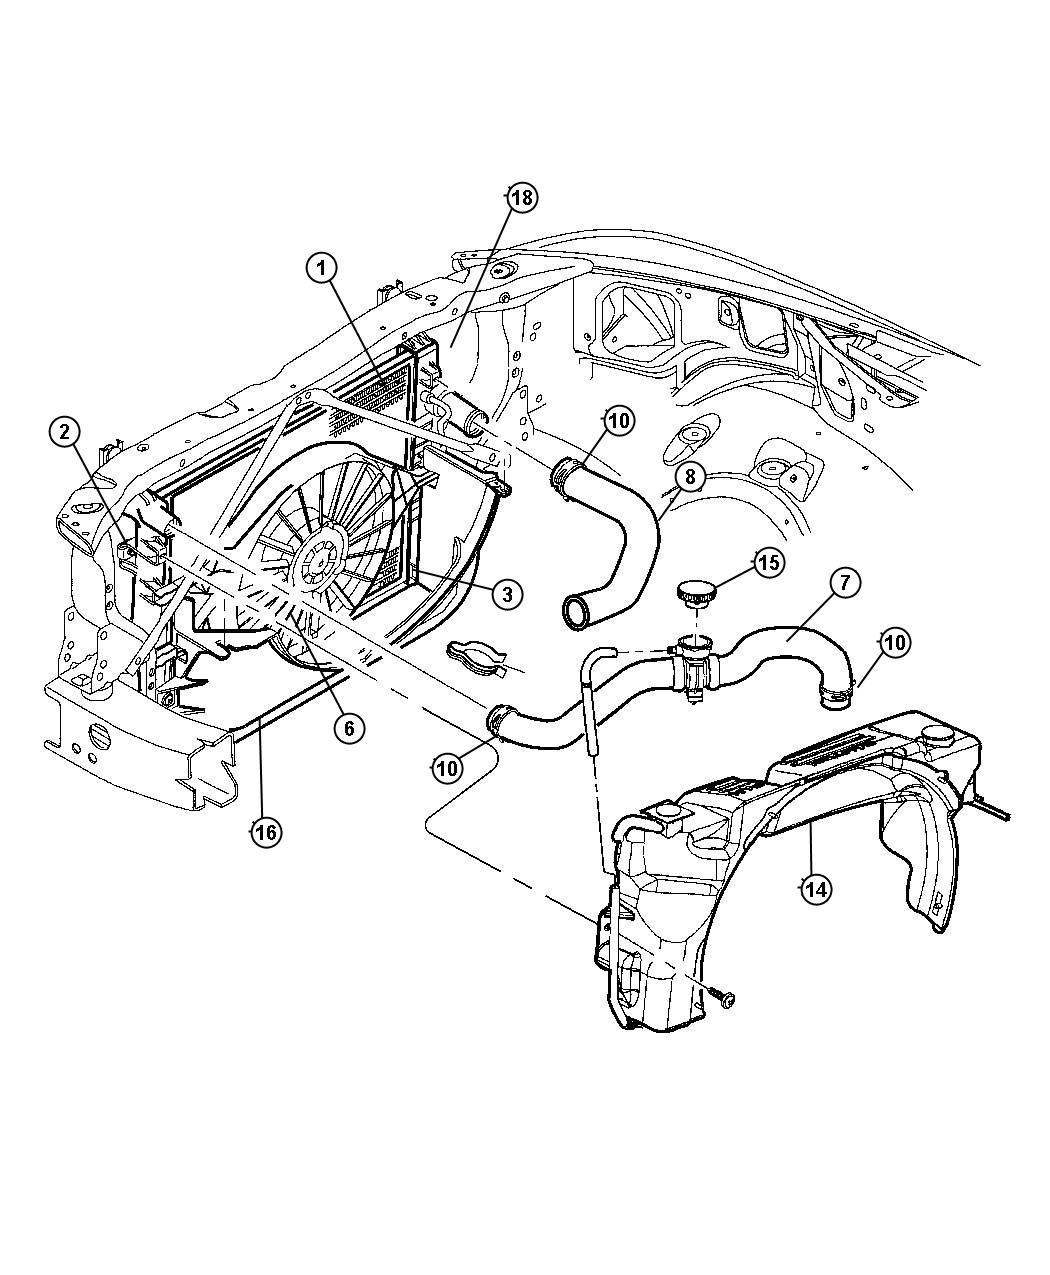 Dodge Dakota Radiator And Related Parts 4 7l Engine